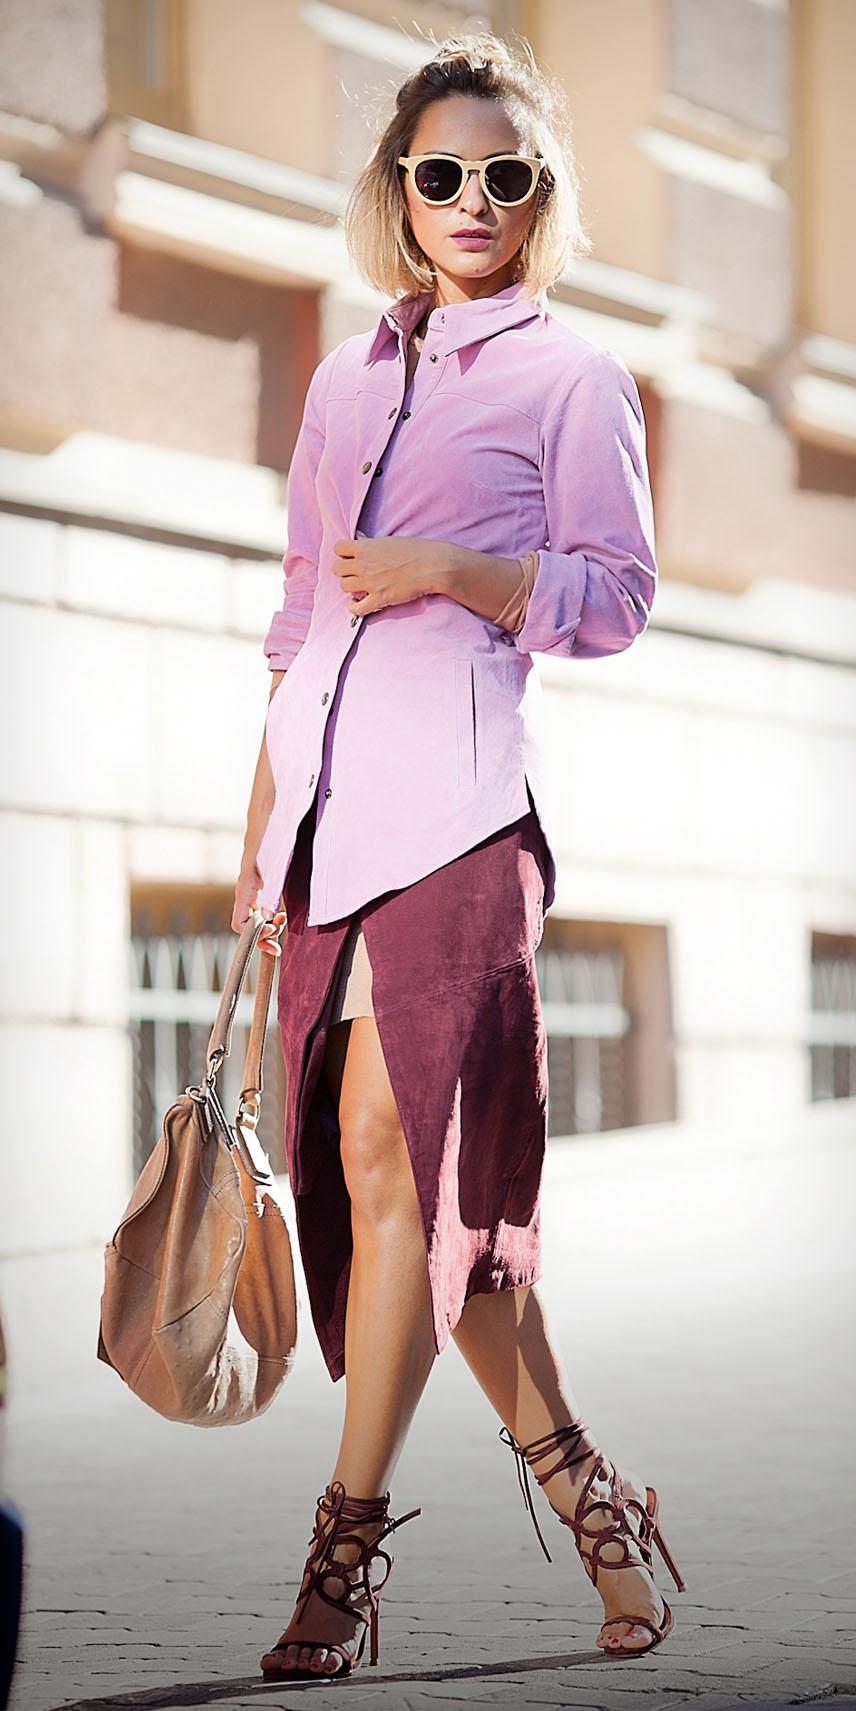 burgundy-midi-skirt-wrap-tan-bag-blonde-sun-bob-burgundy-shoe-sandalh-tonal-pink-light-collared-shirt-spring-summer-lunch.jpg